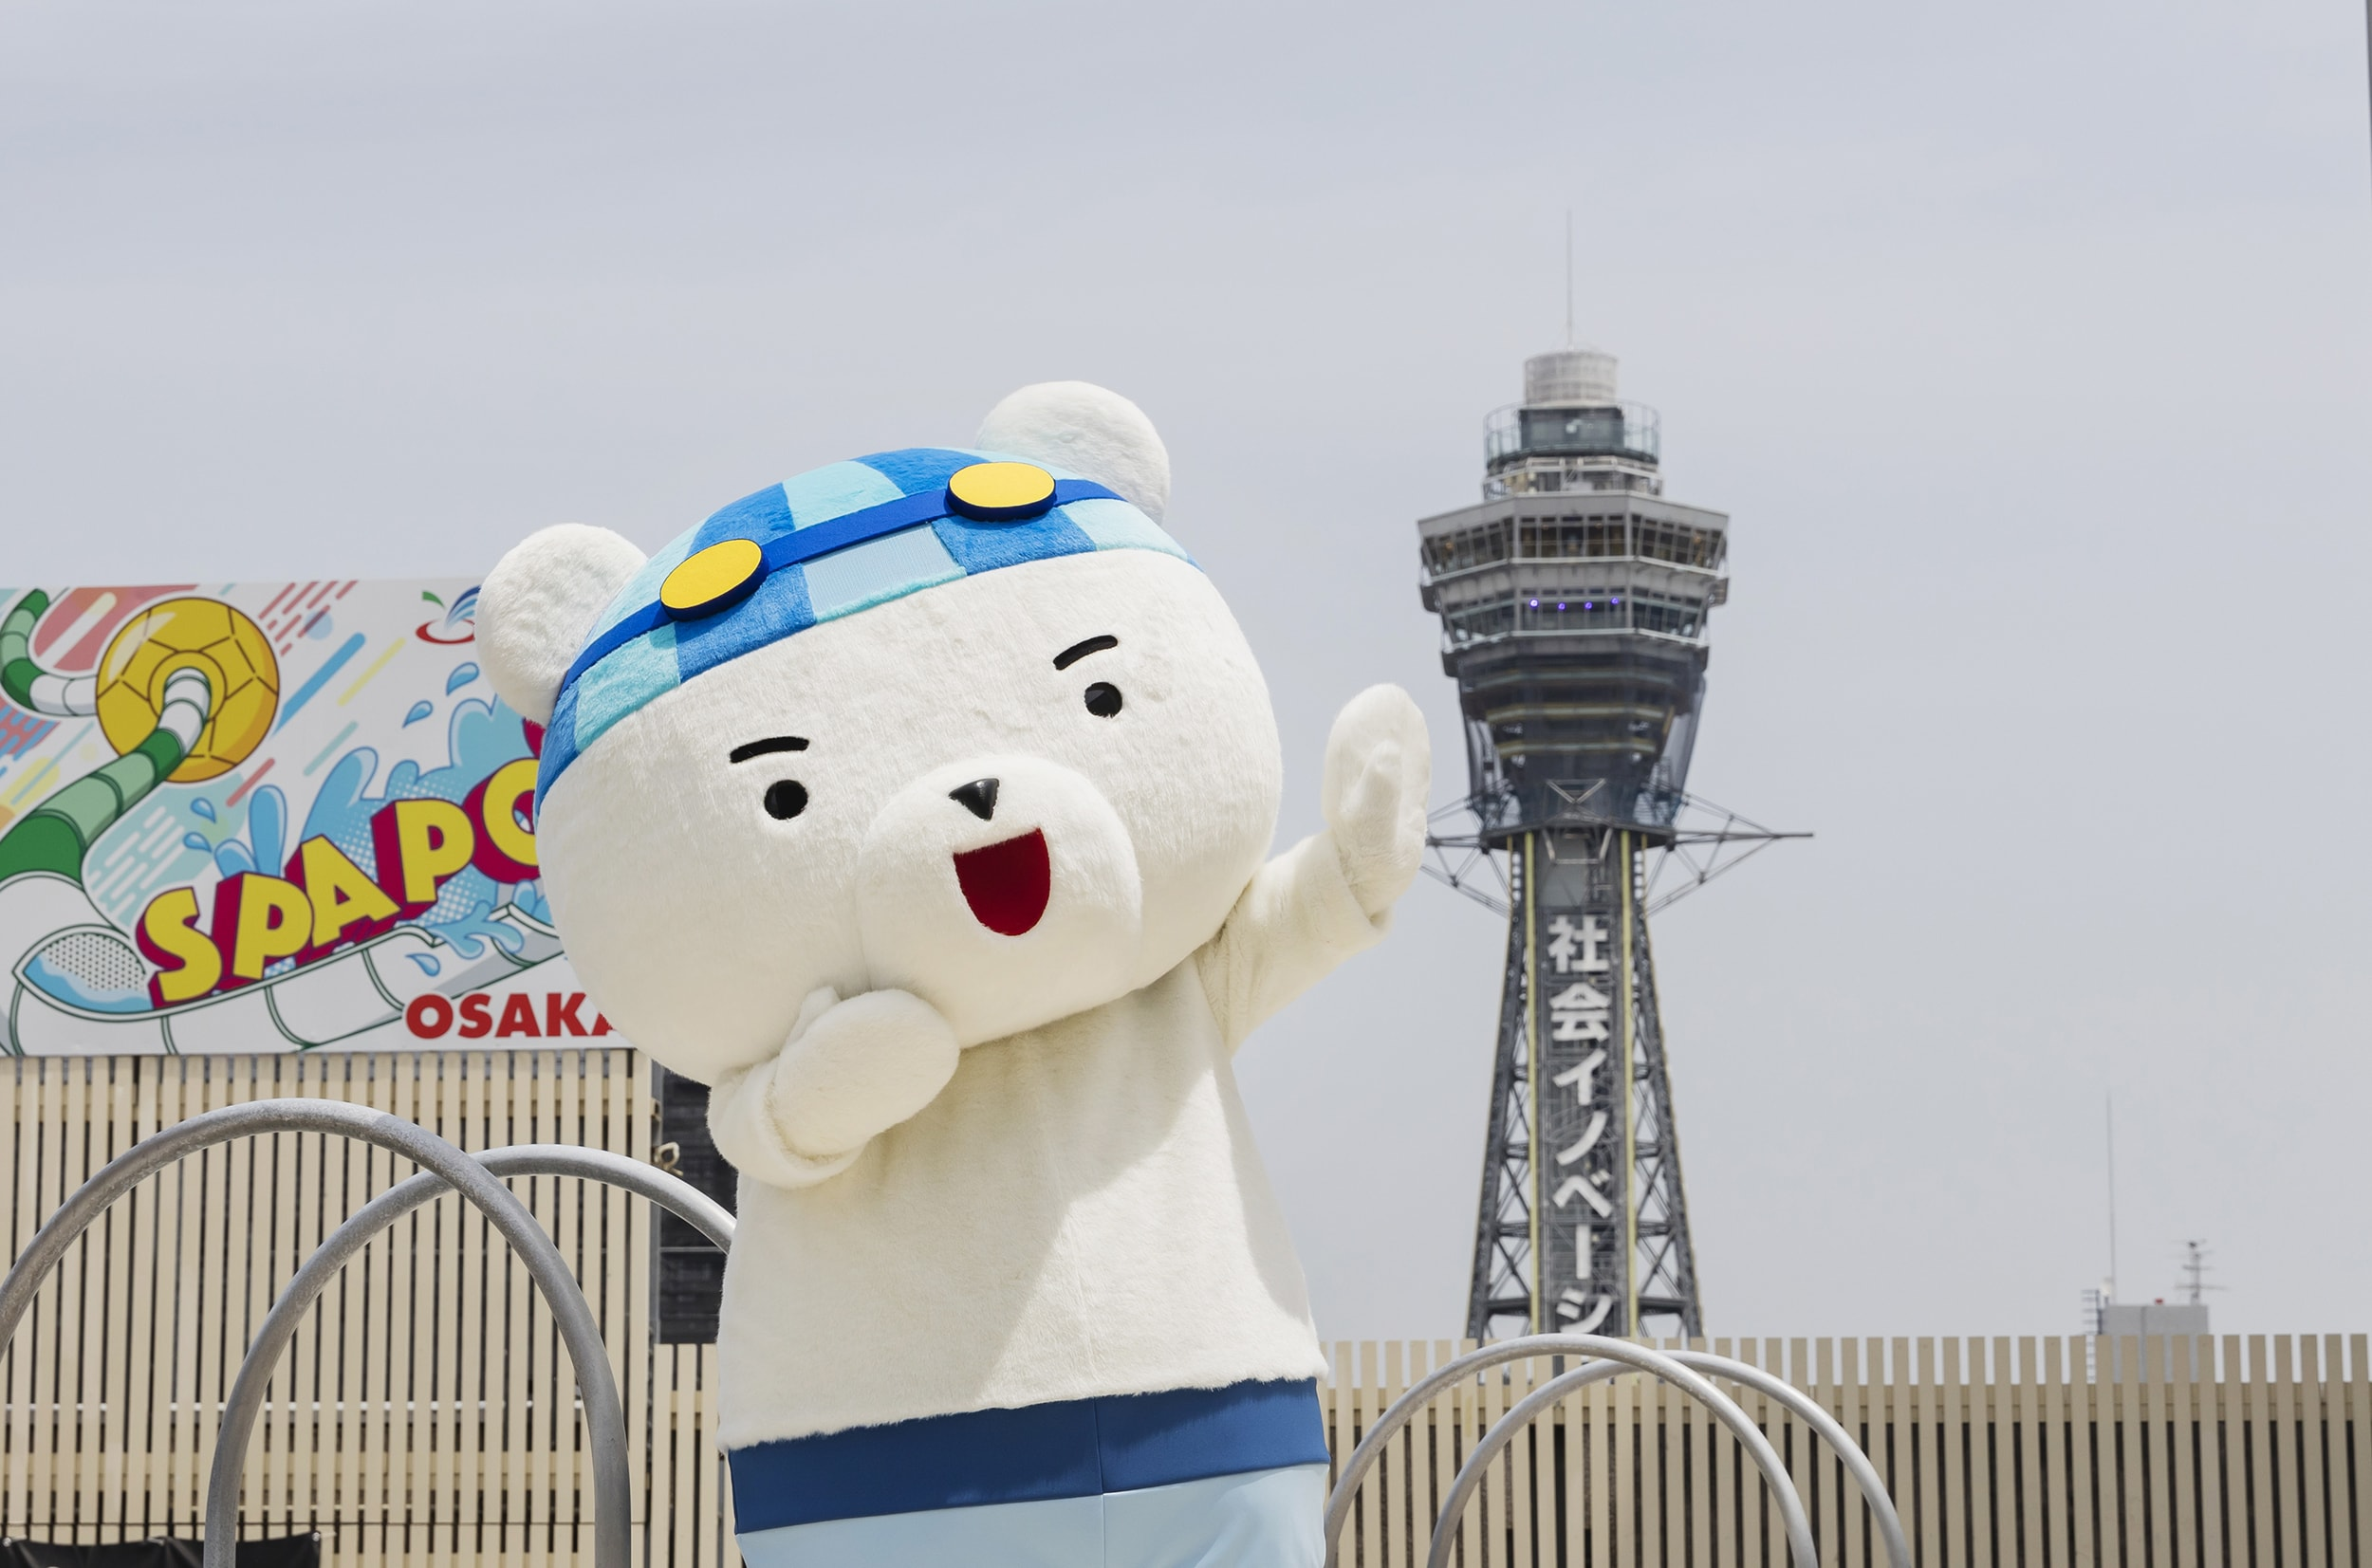 Introducing Osaka themed playing cards designed by Yasuko Sensyu, a popular, internationally-renowned illustrator from Osaka!